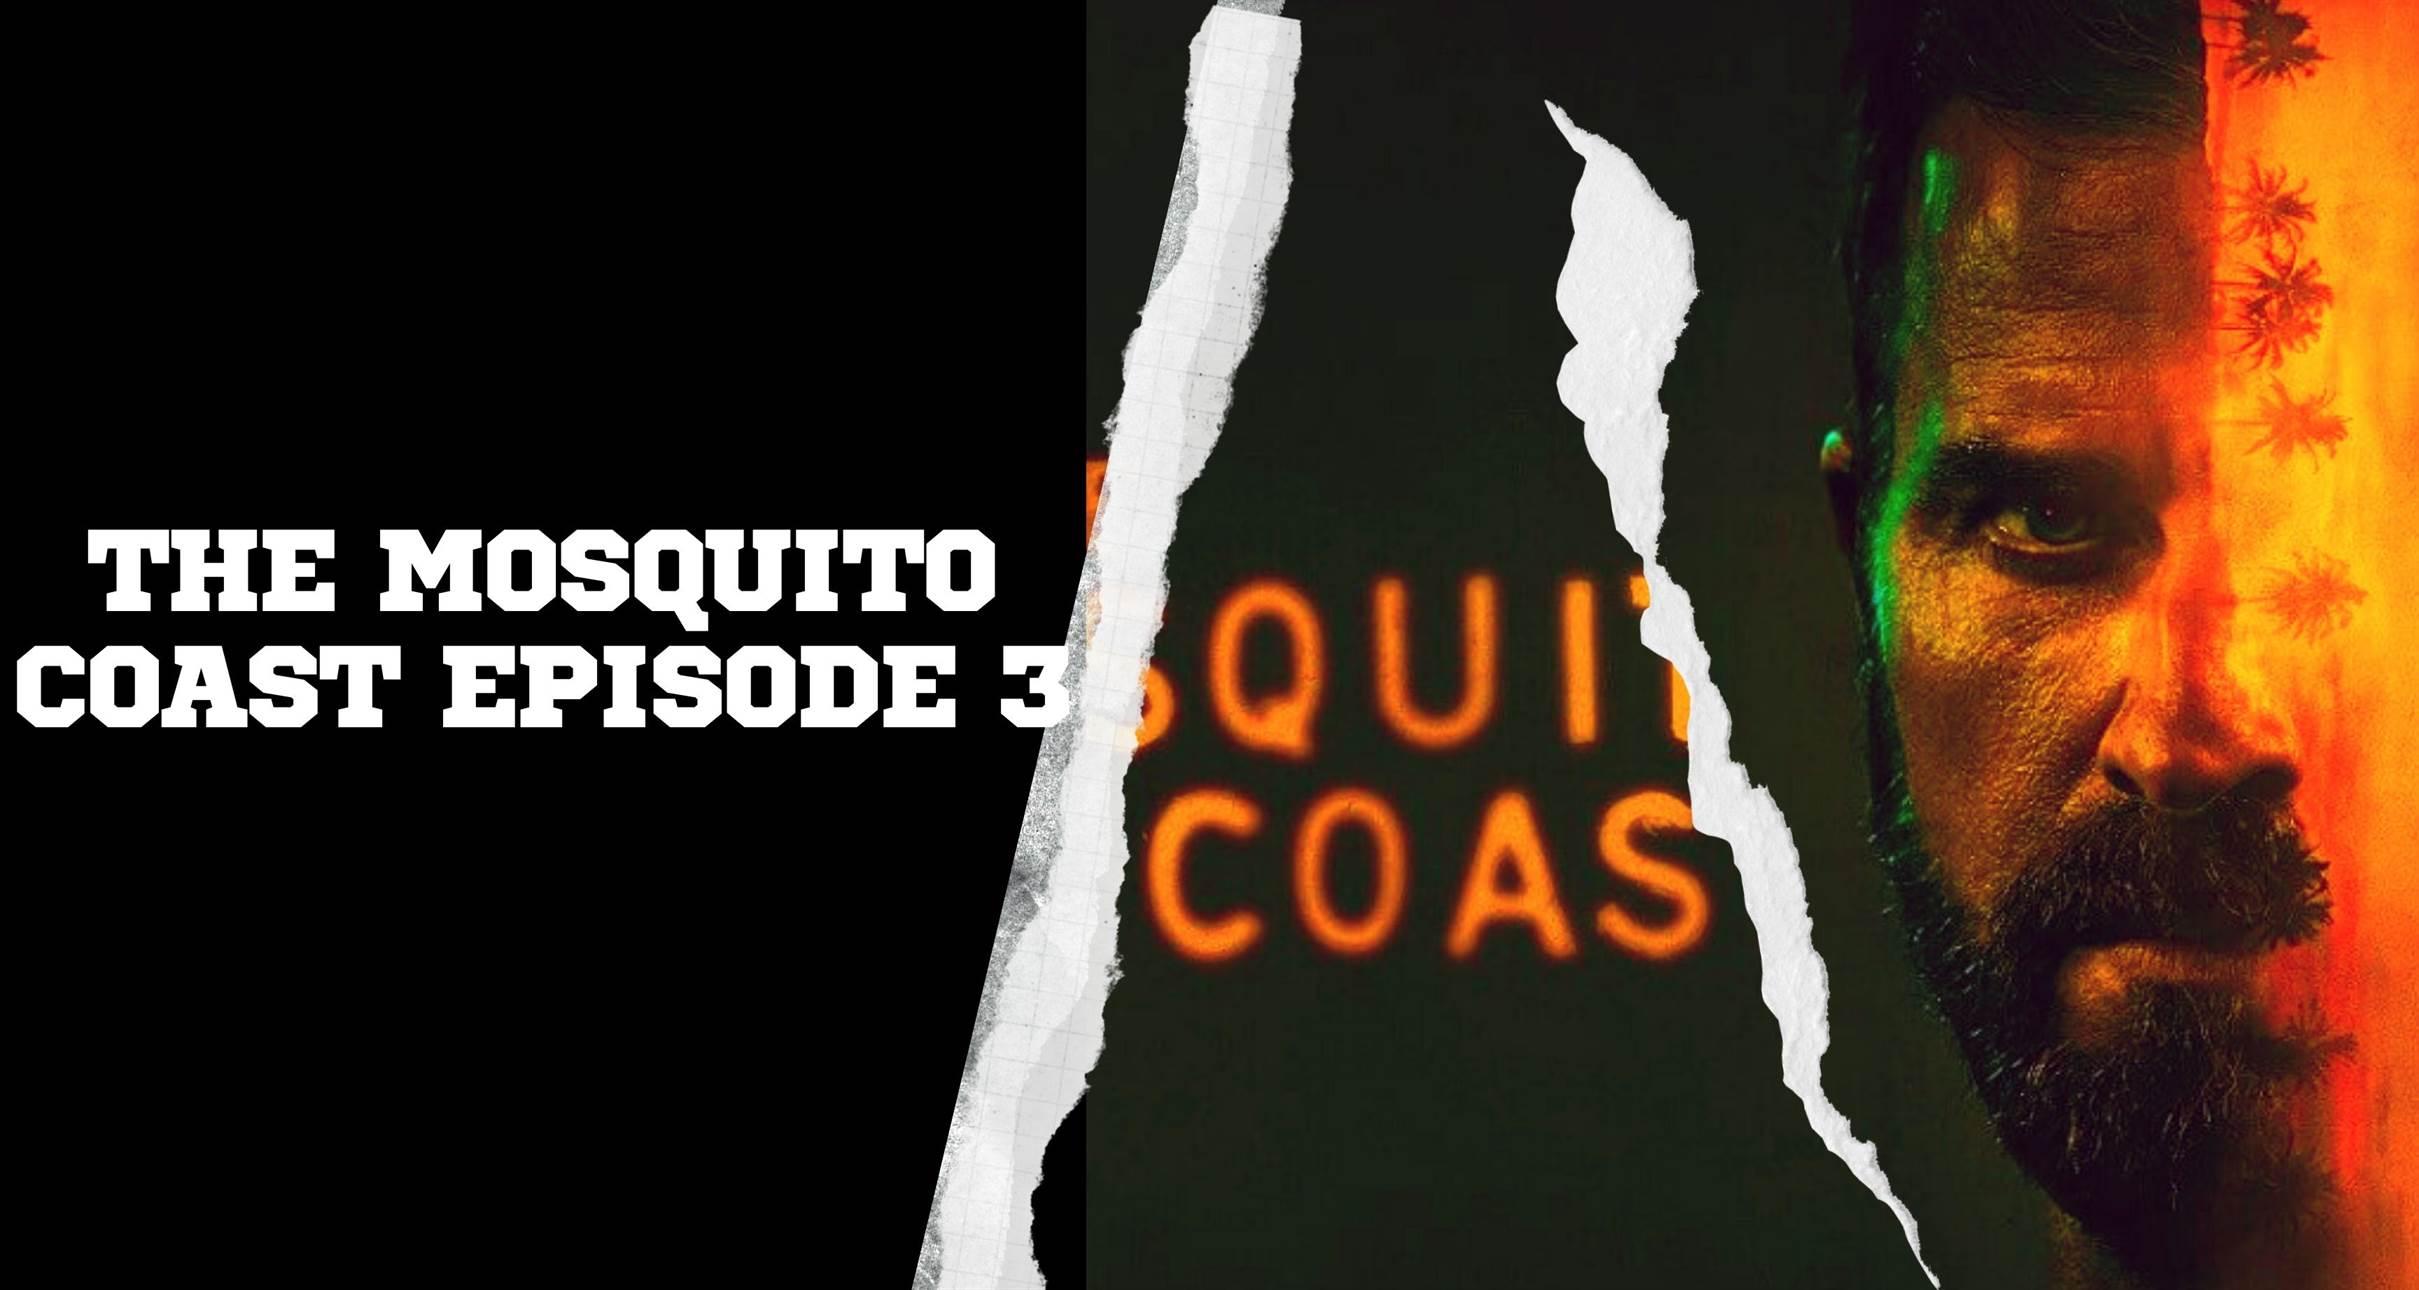 The Mosquito Coast Episode 3